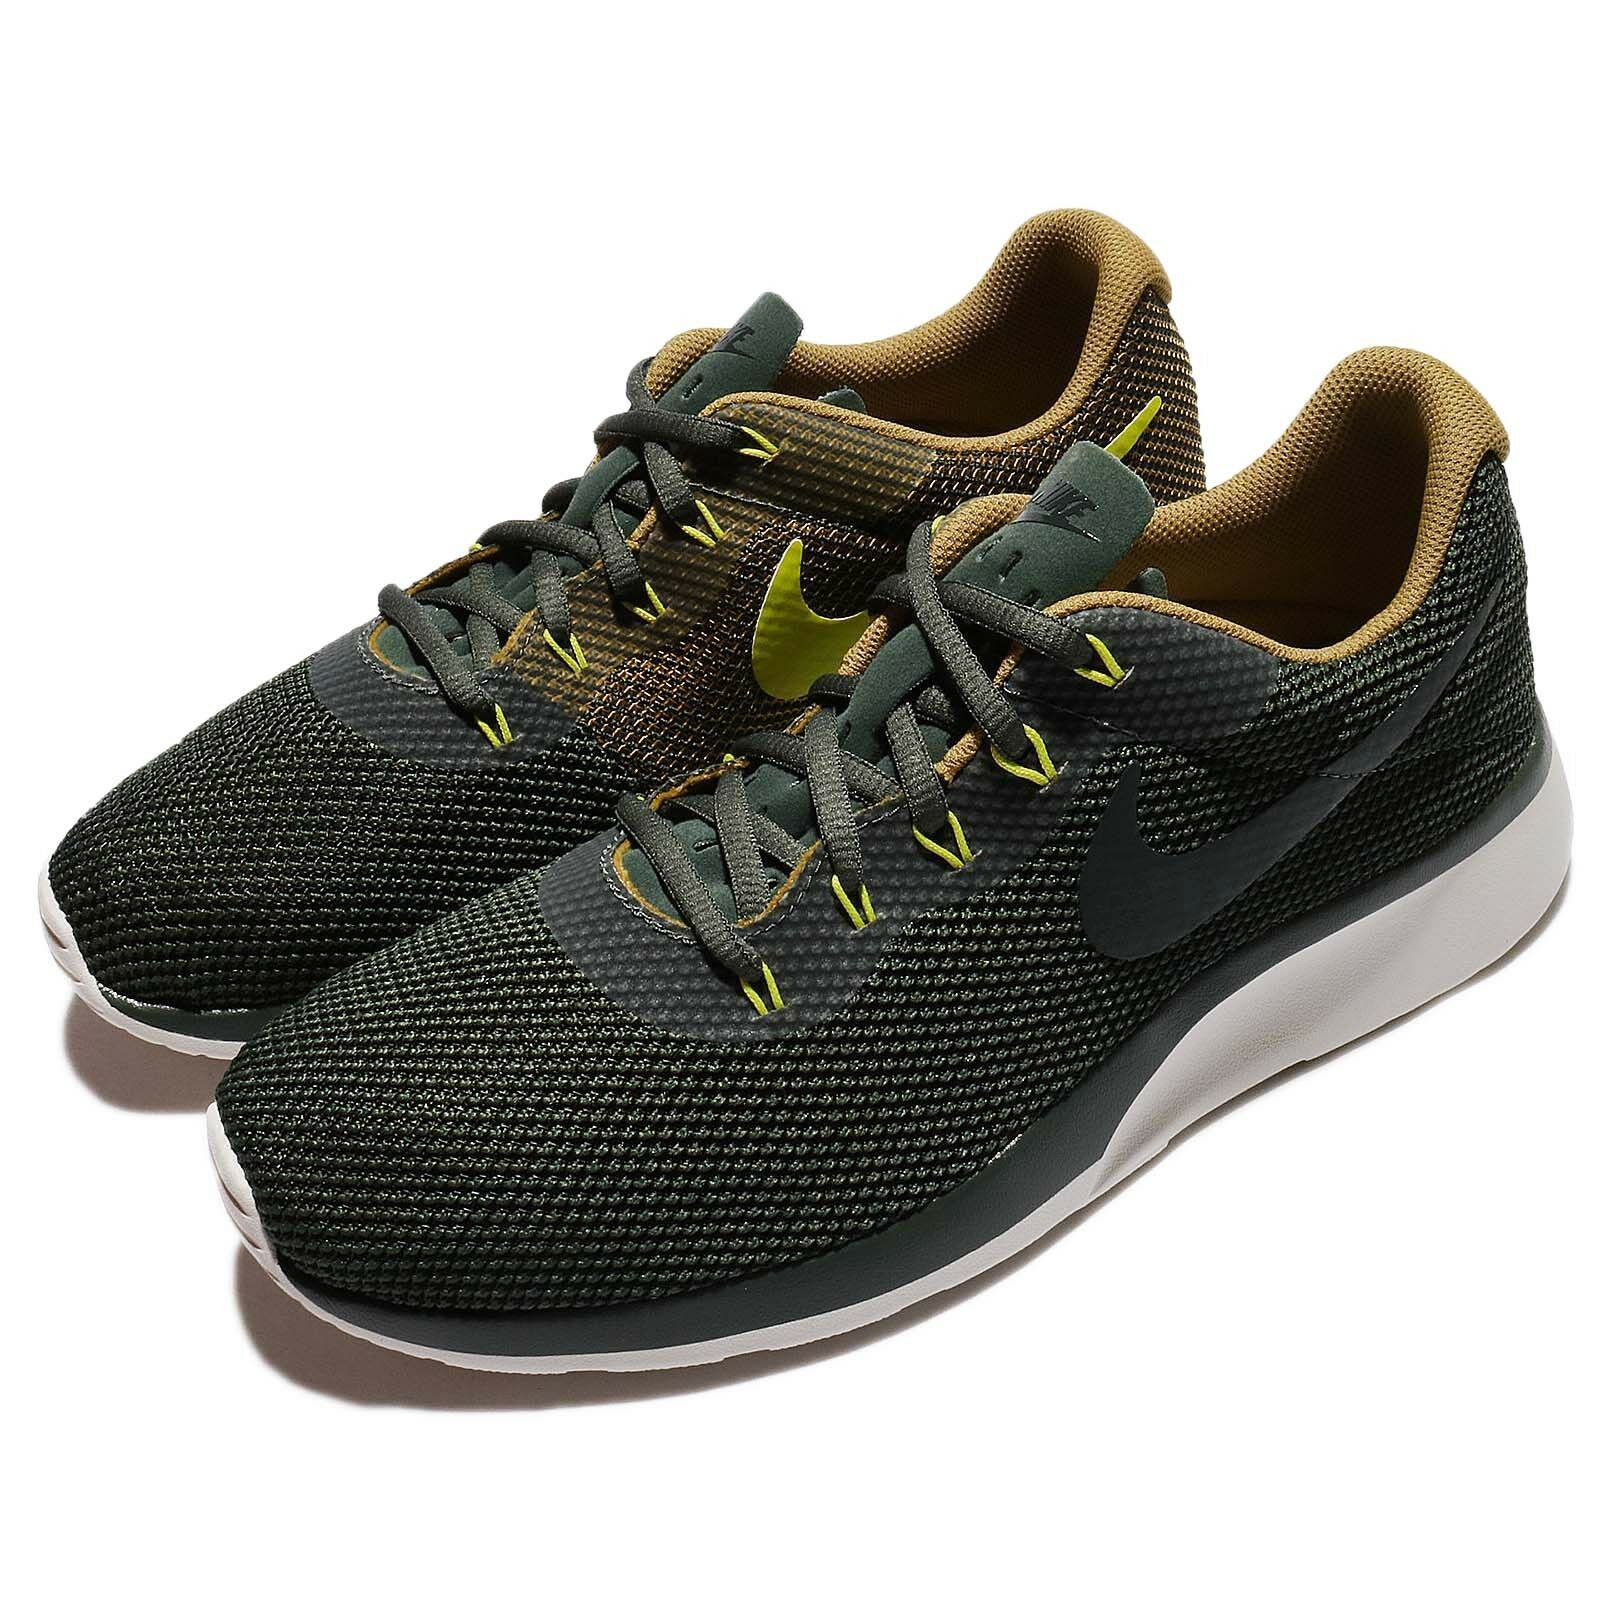 Nike Tanjun Racer Vintage Outdoor Green Men Running Shoes Sneakers 921669-300